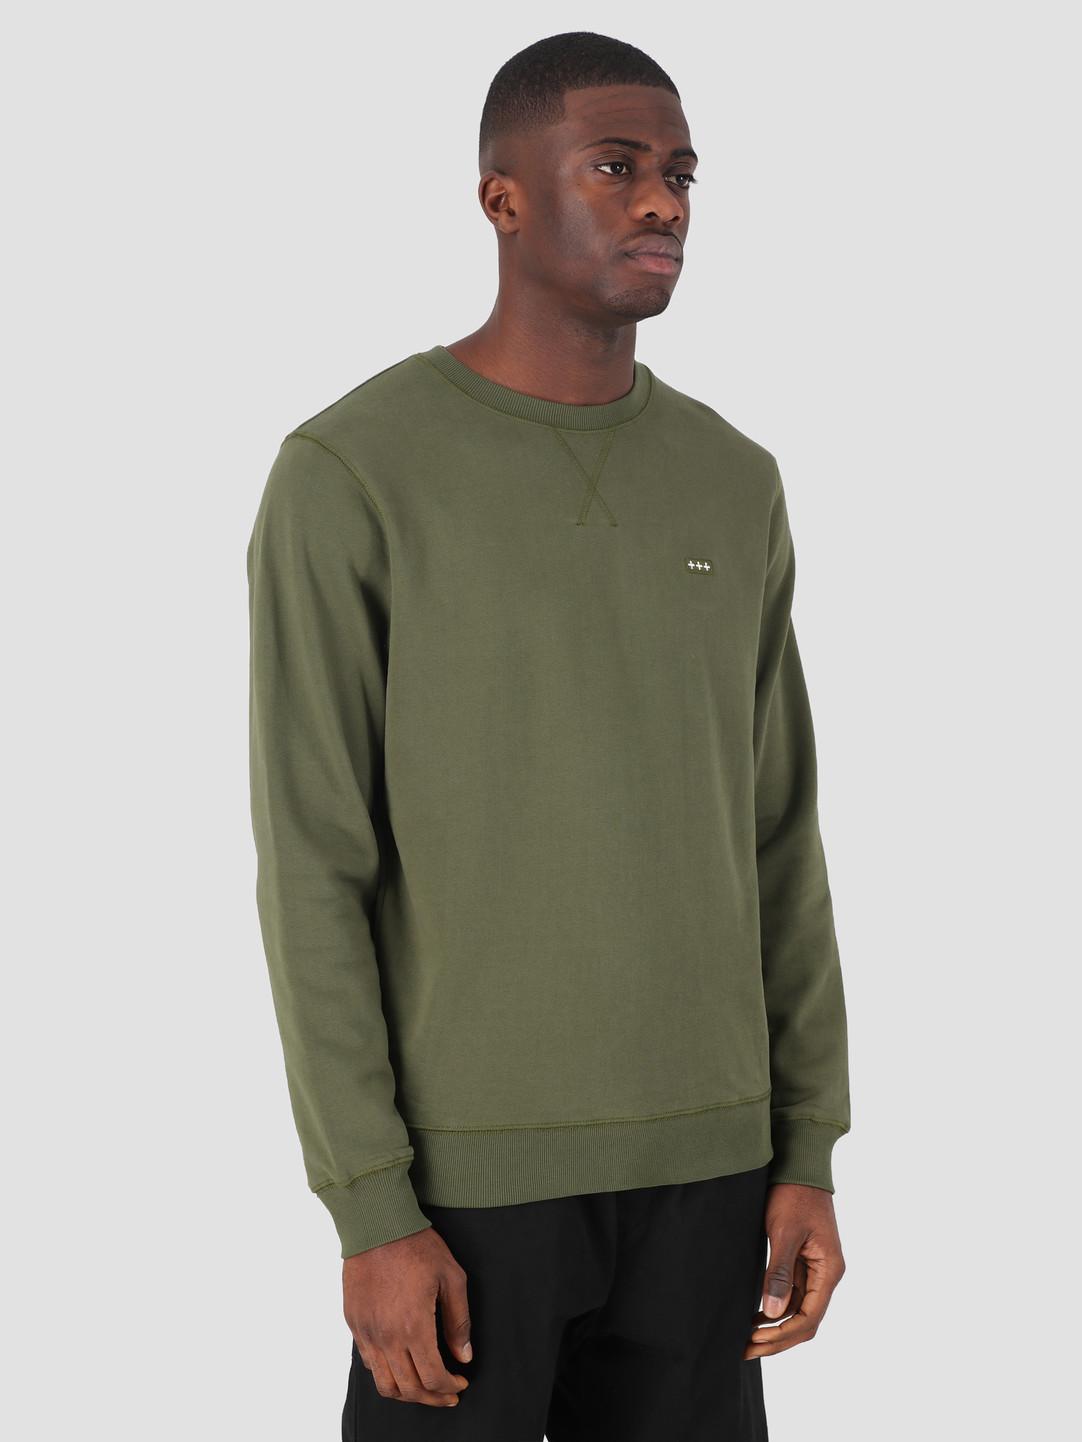 Quality Blanks Quality Blanks QB94 Patch Logo Crewneck Military Green